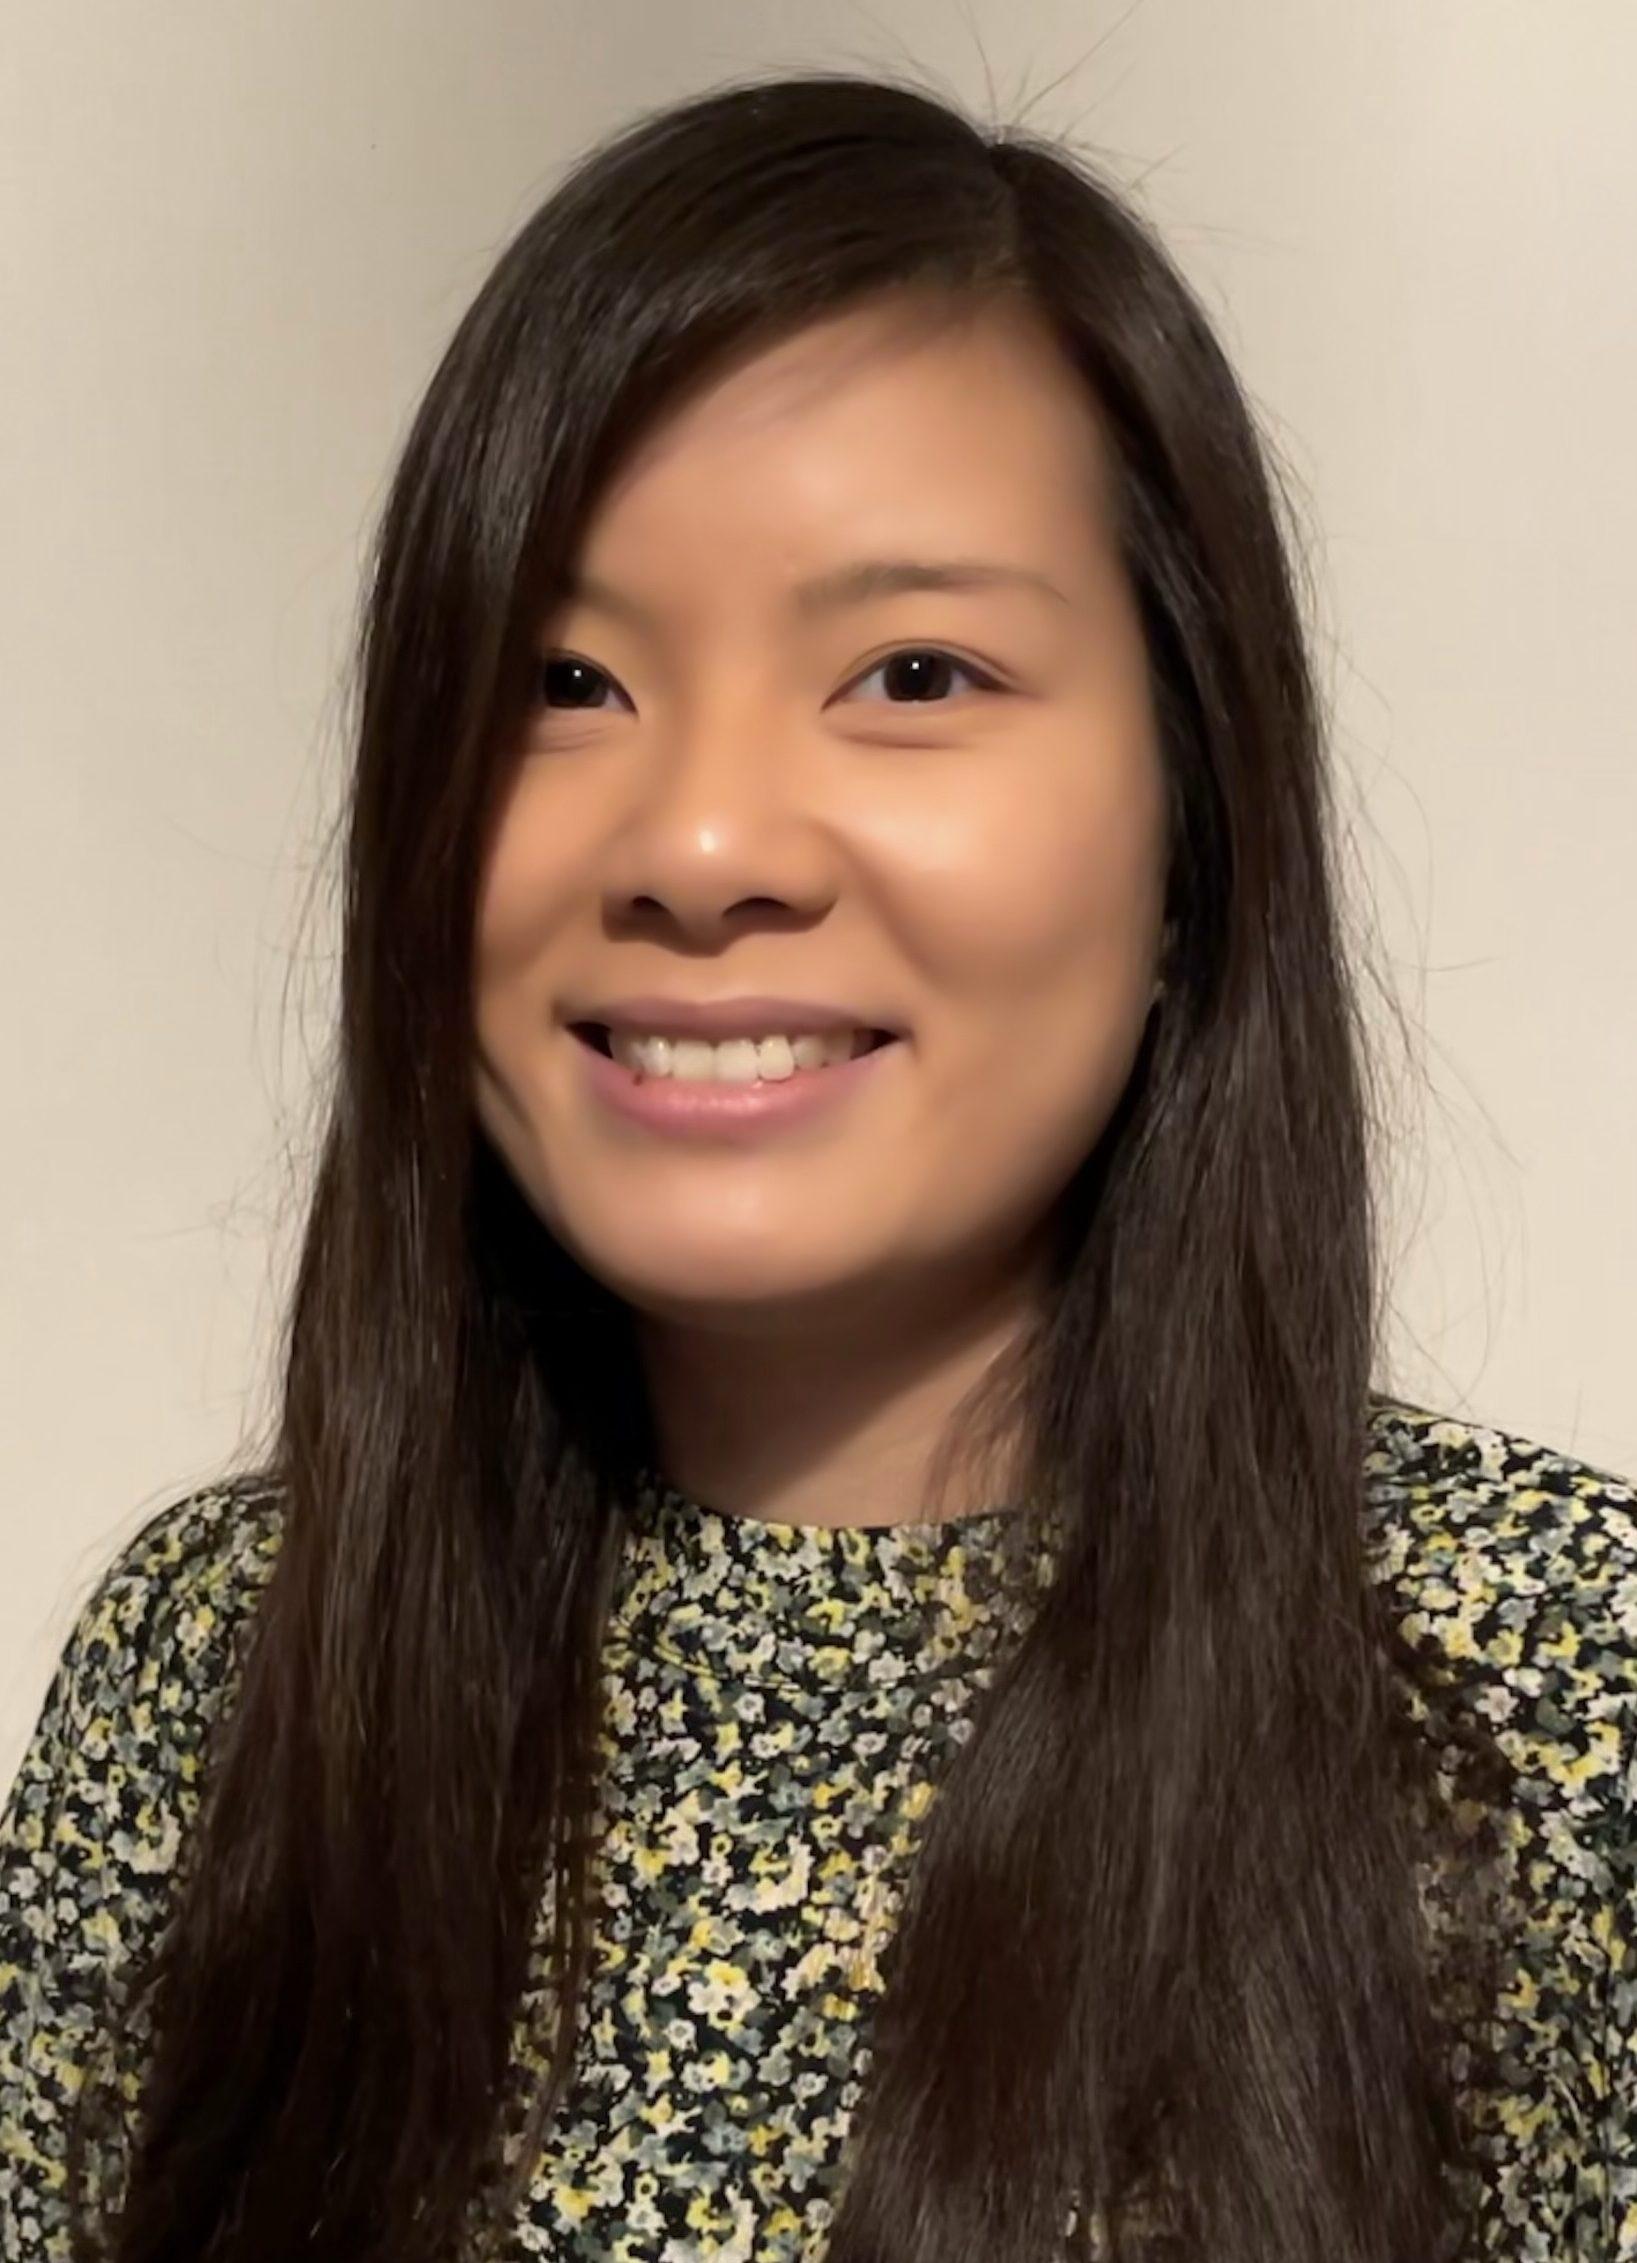 Pui Yuen Lee